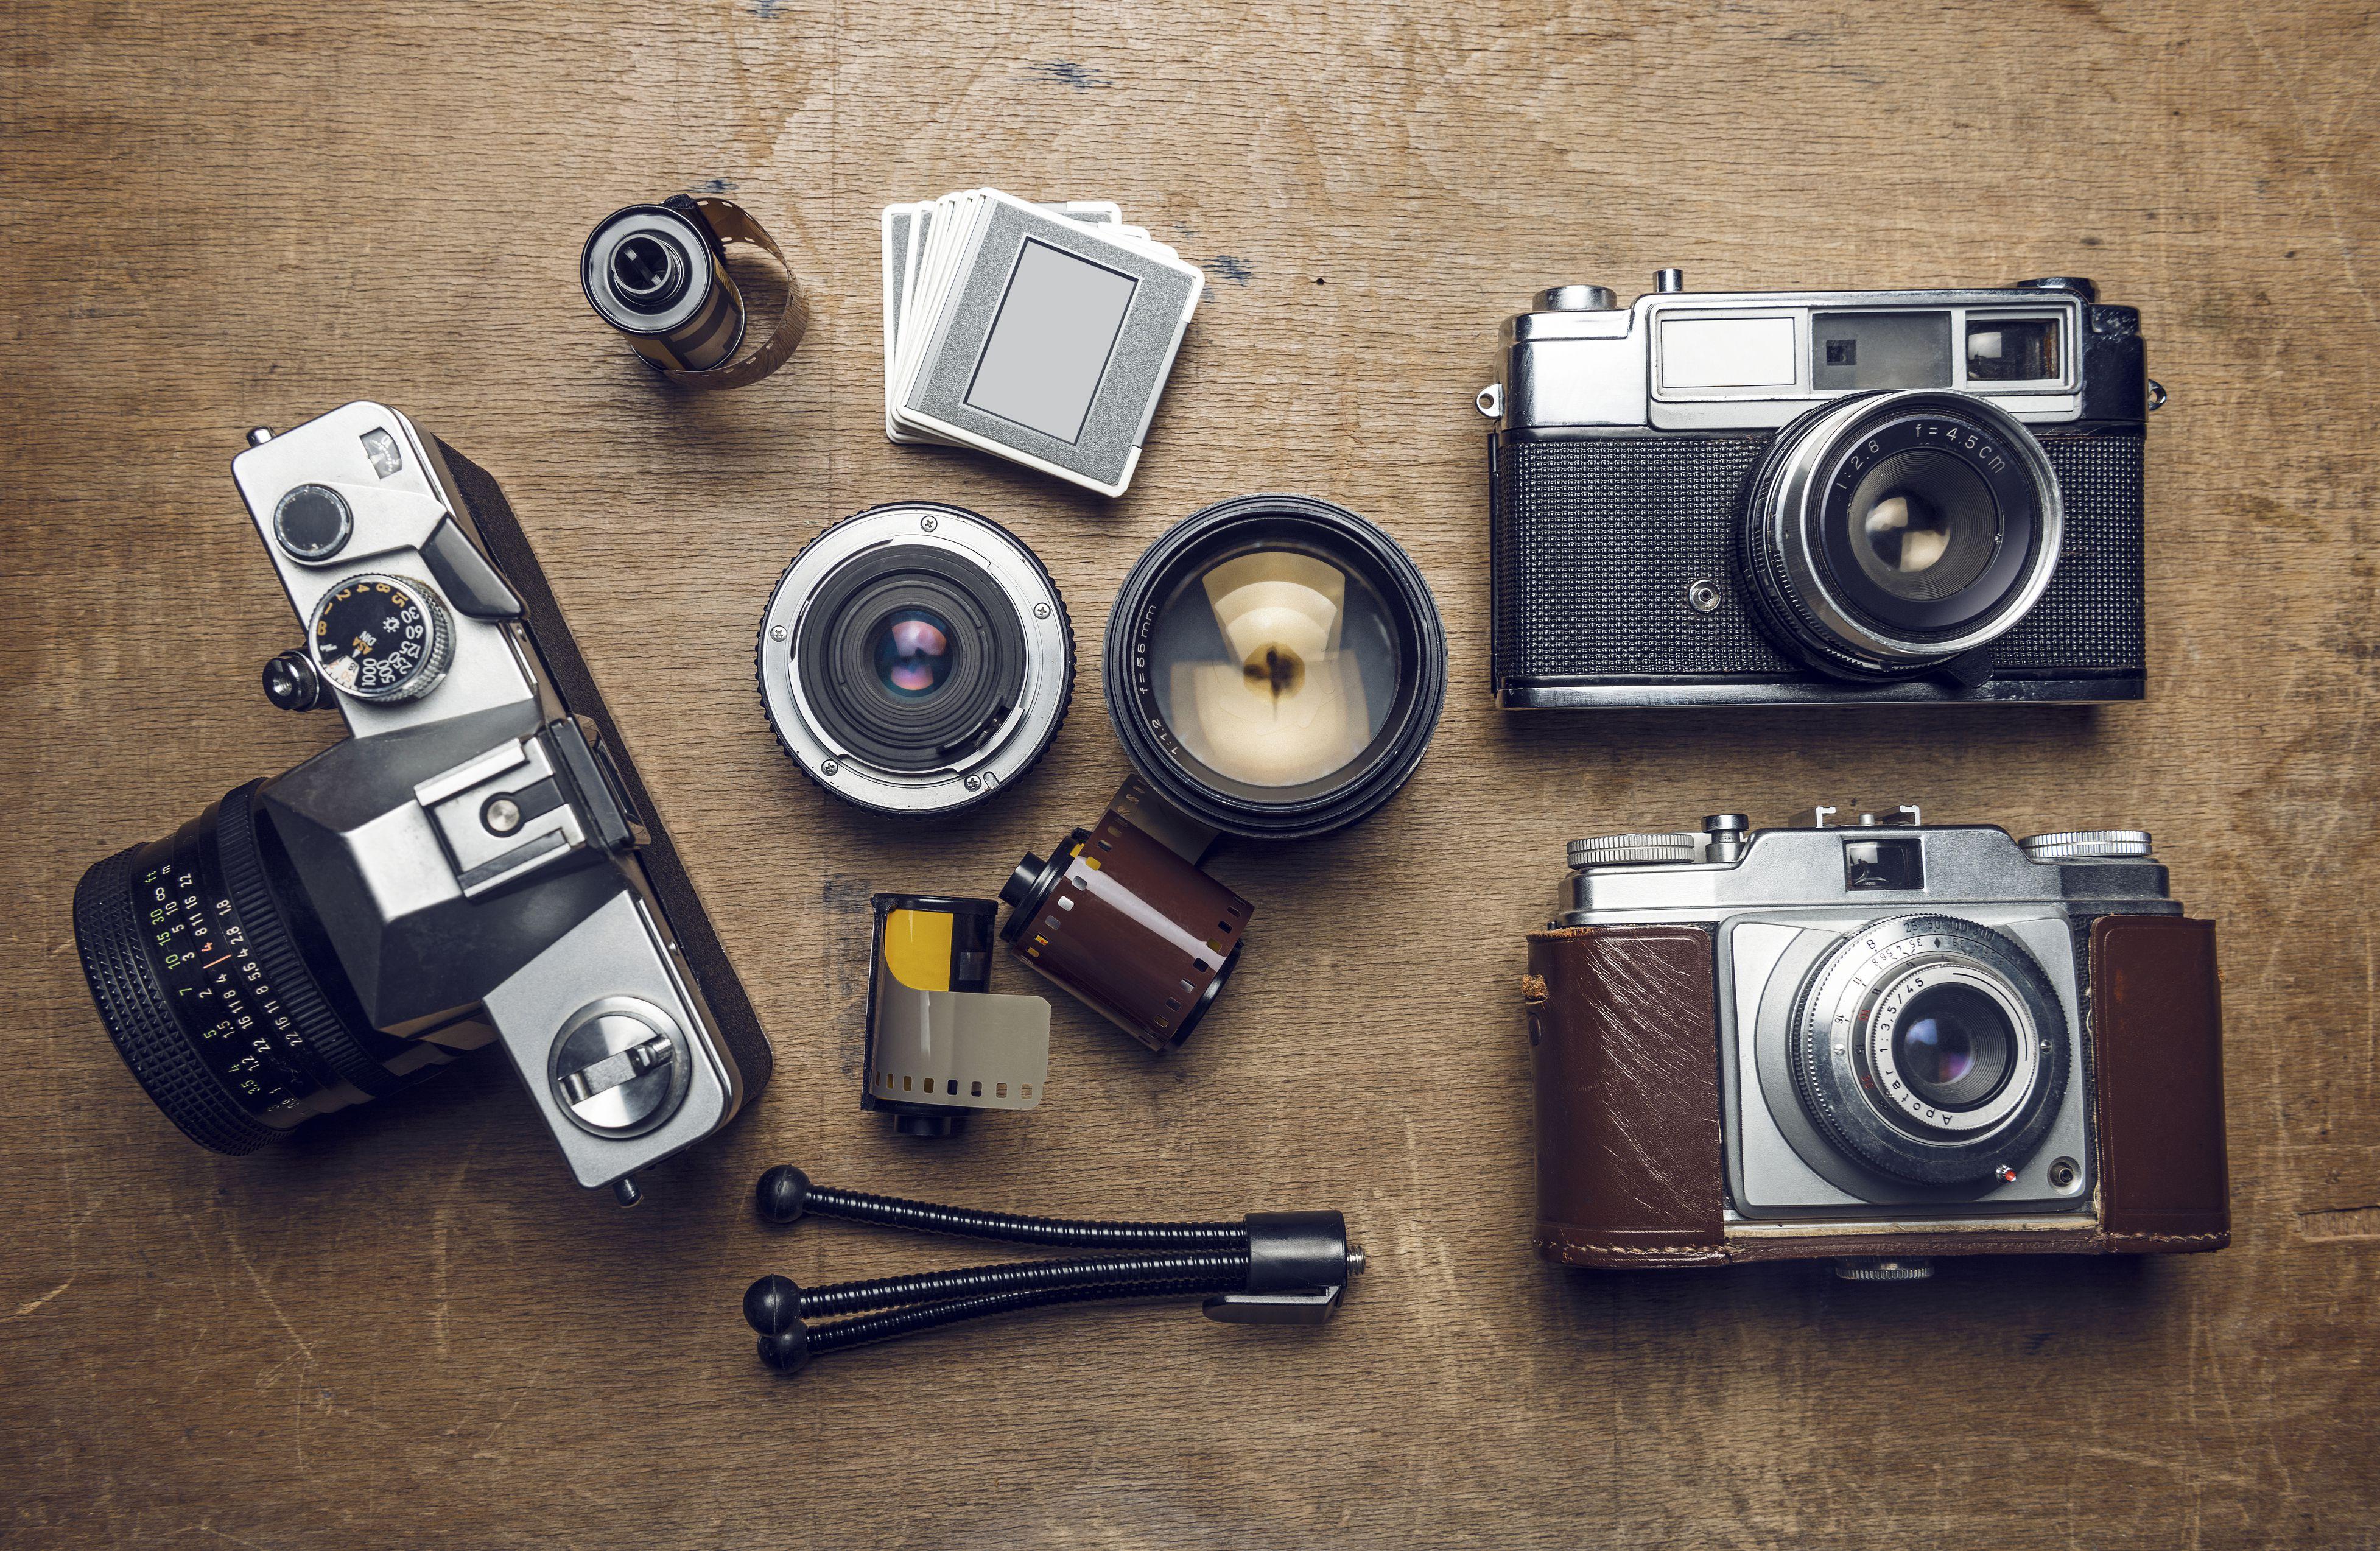 film history digital camera cameras photographic equipment lenses filters fill